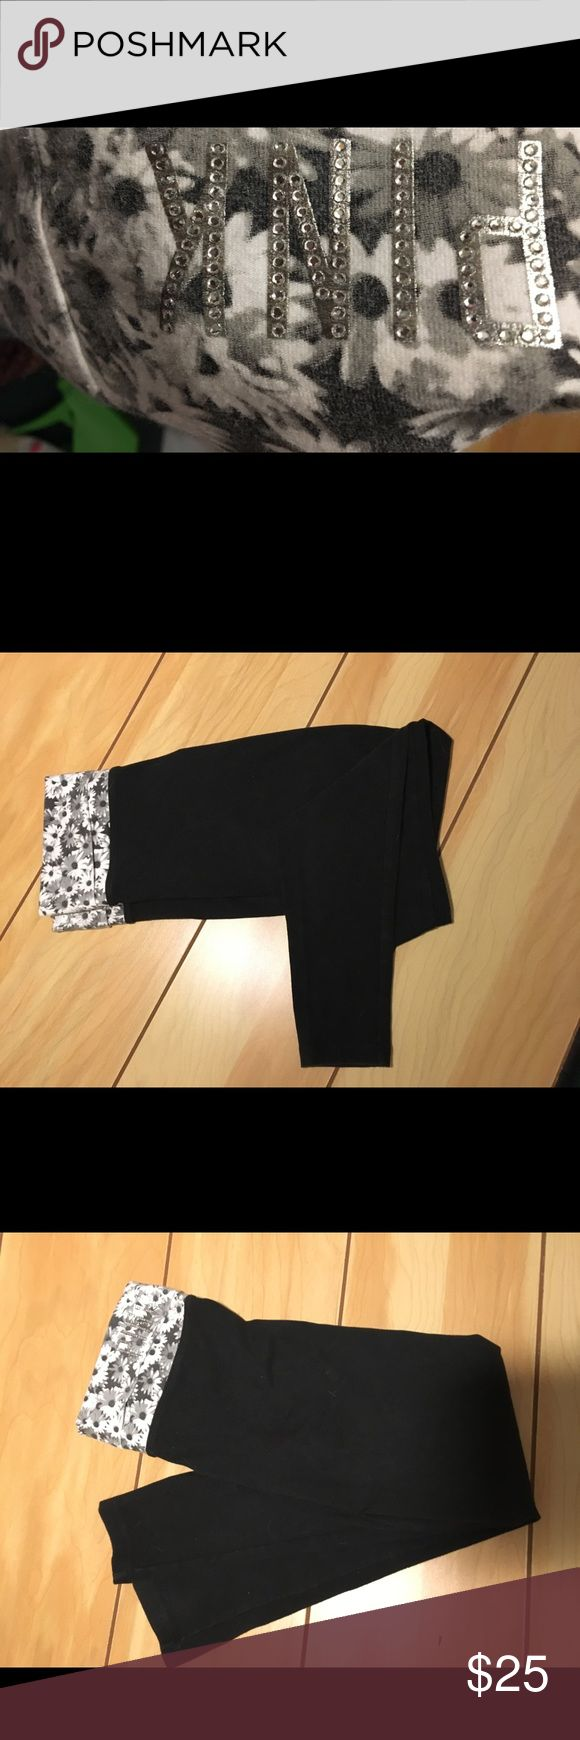 Black dress yoga pants kryptonite